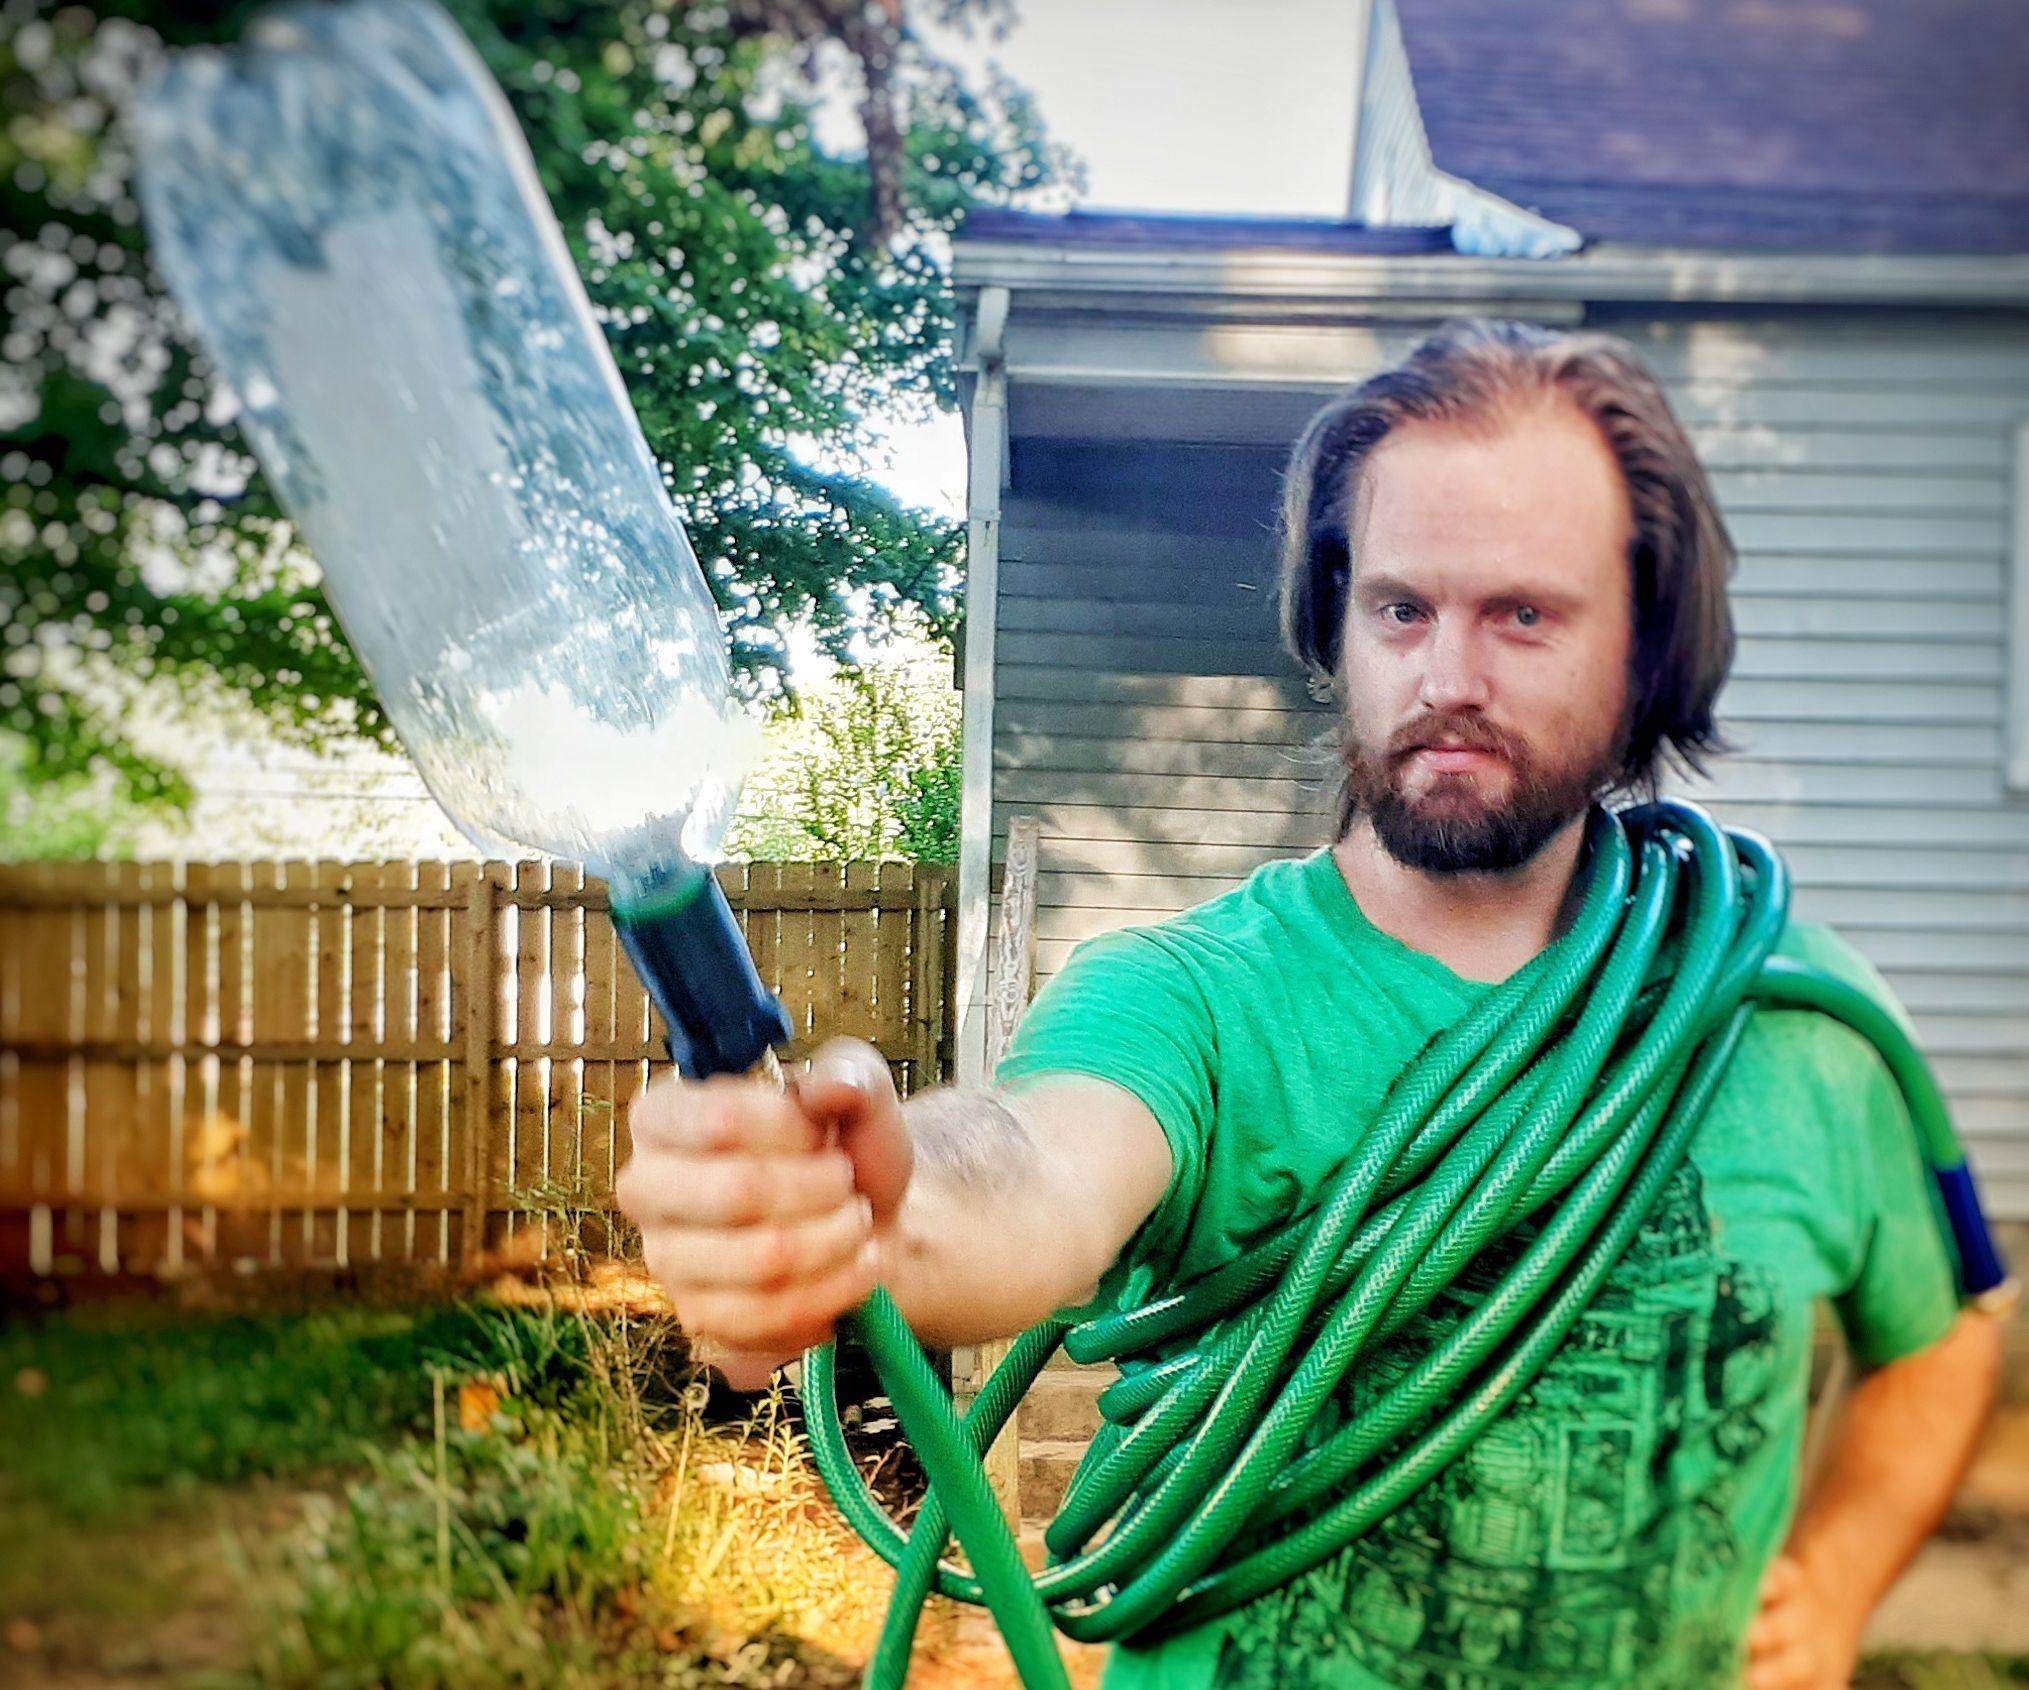 Backyard Play Sprinkler (in 3 Easy Steps!)